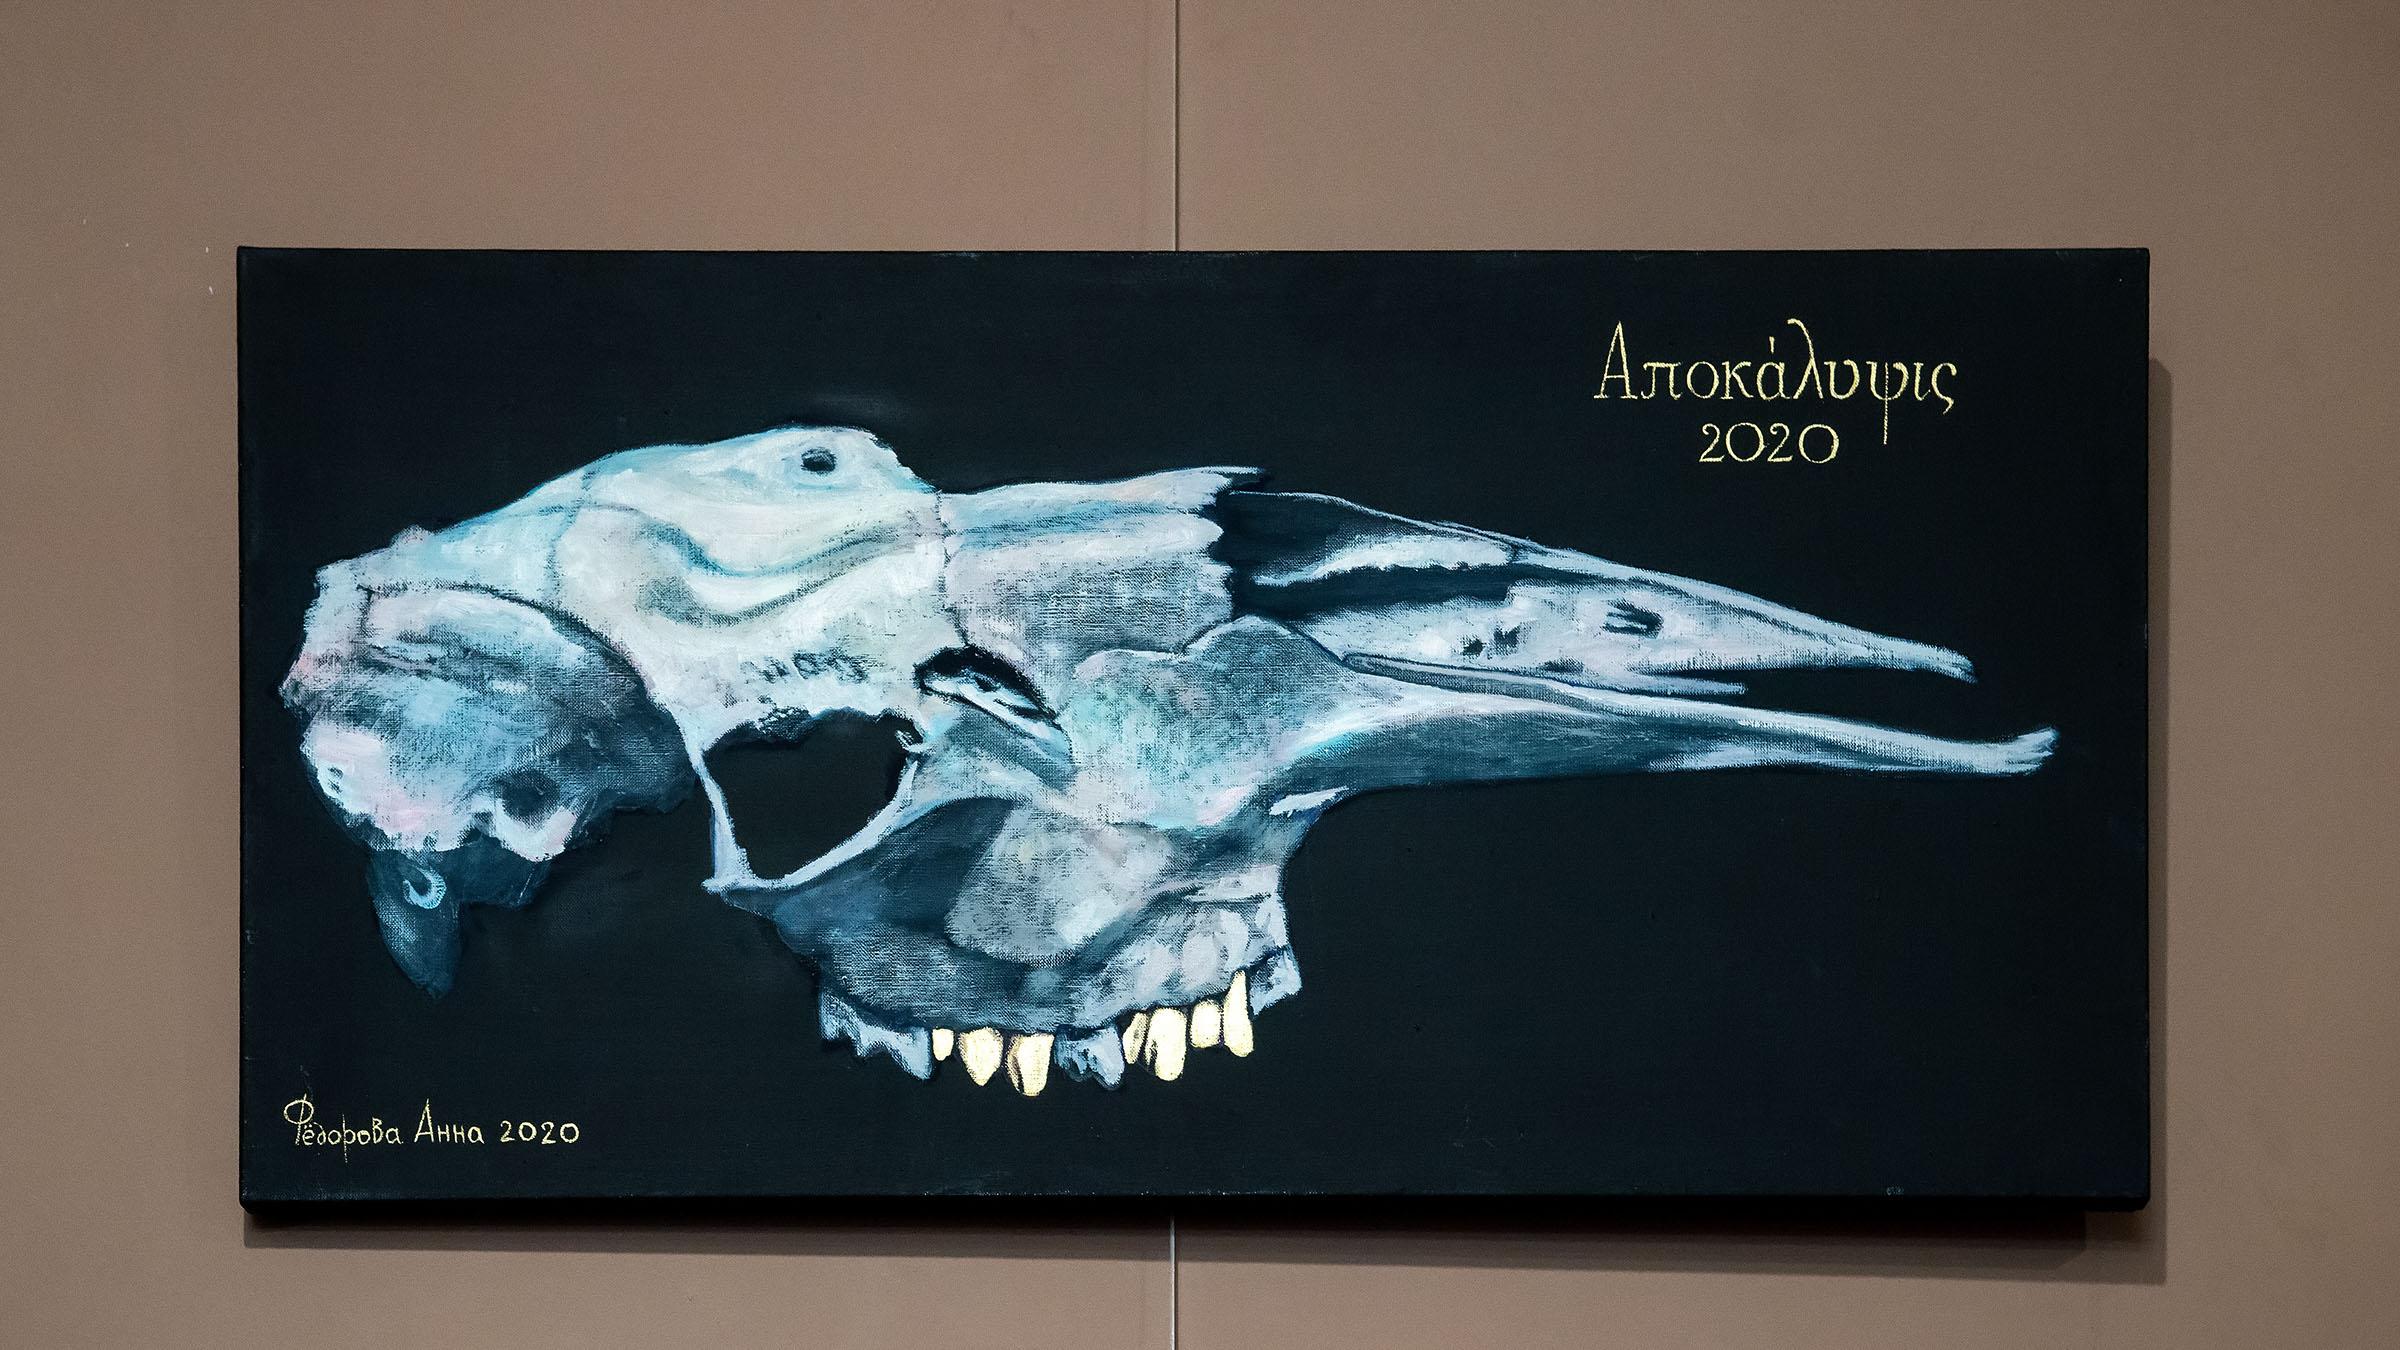 Апокалипсис 2020. Анна Федорова::«Апокалипсис. Возрождение ». Адель Халиуллин (скульптура), Анна Федорова (живопись)